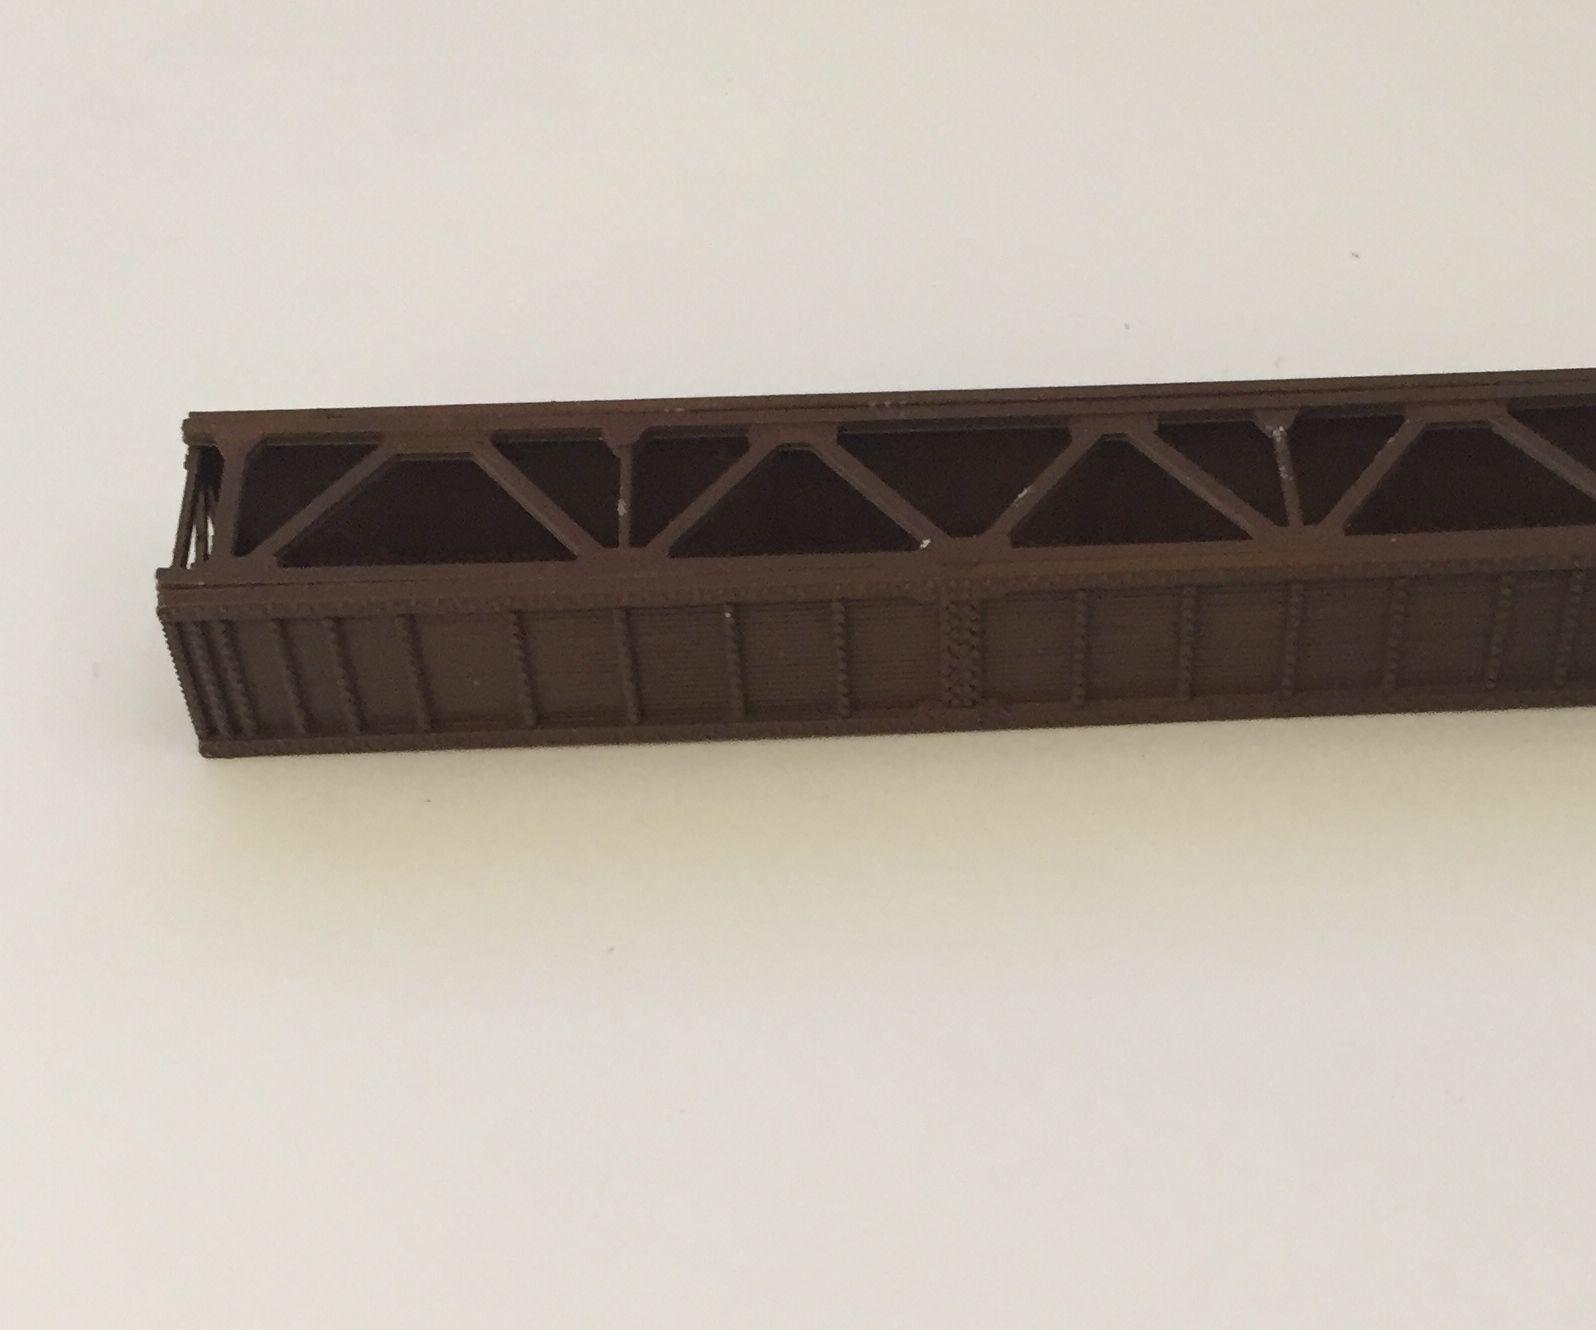 Building a 1:160 (N) Scale Model of a Plate Girder Railroad